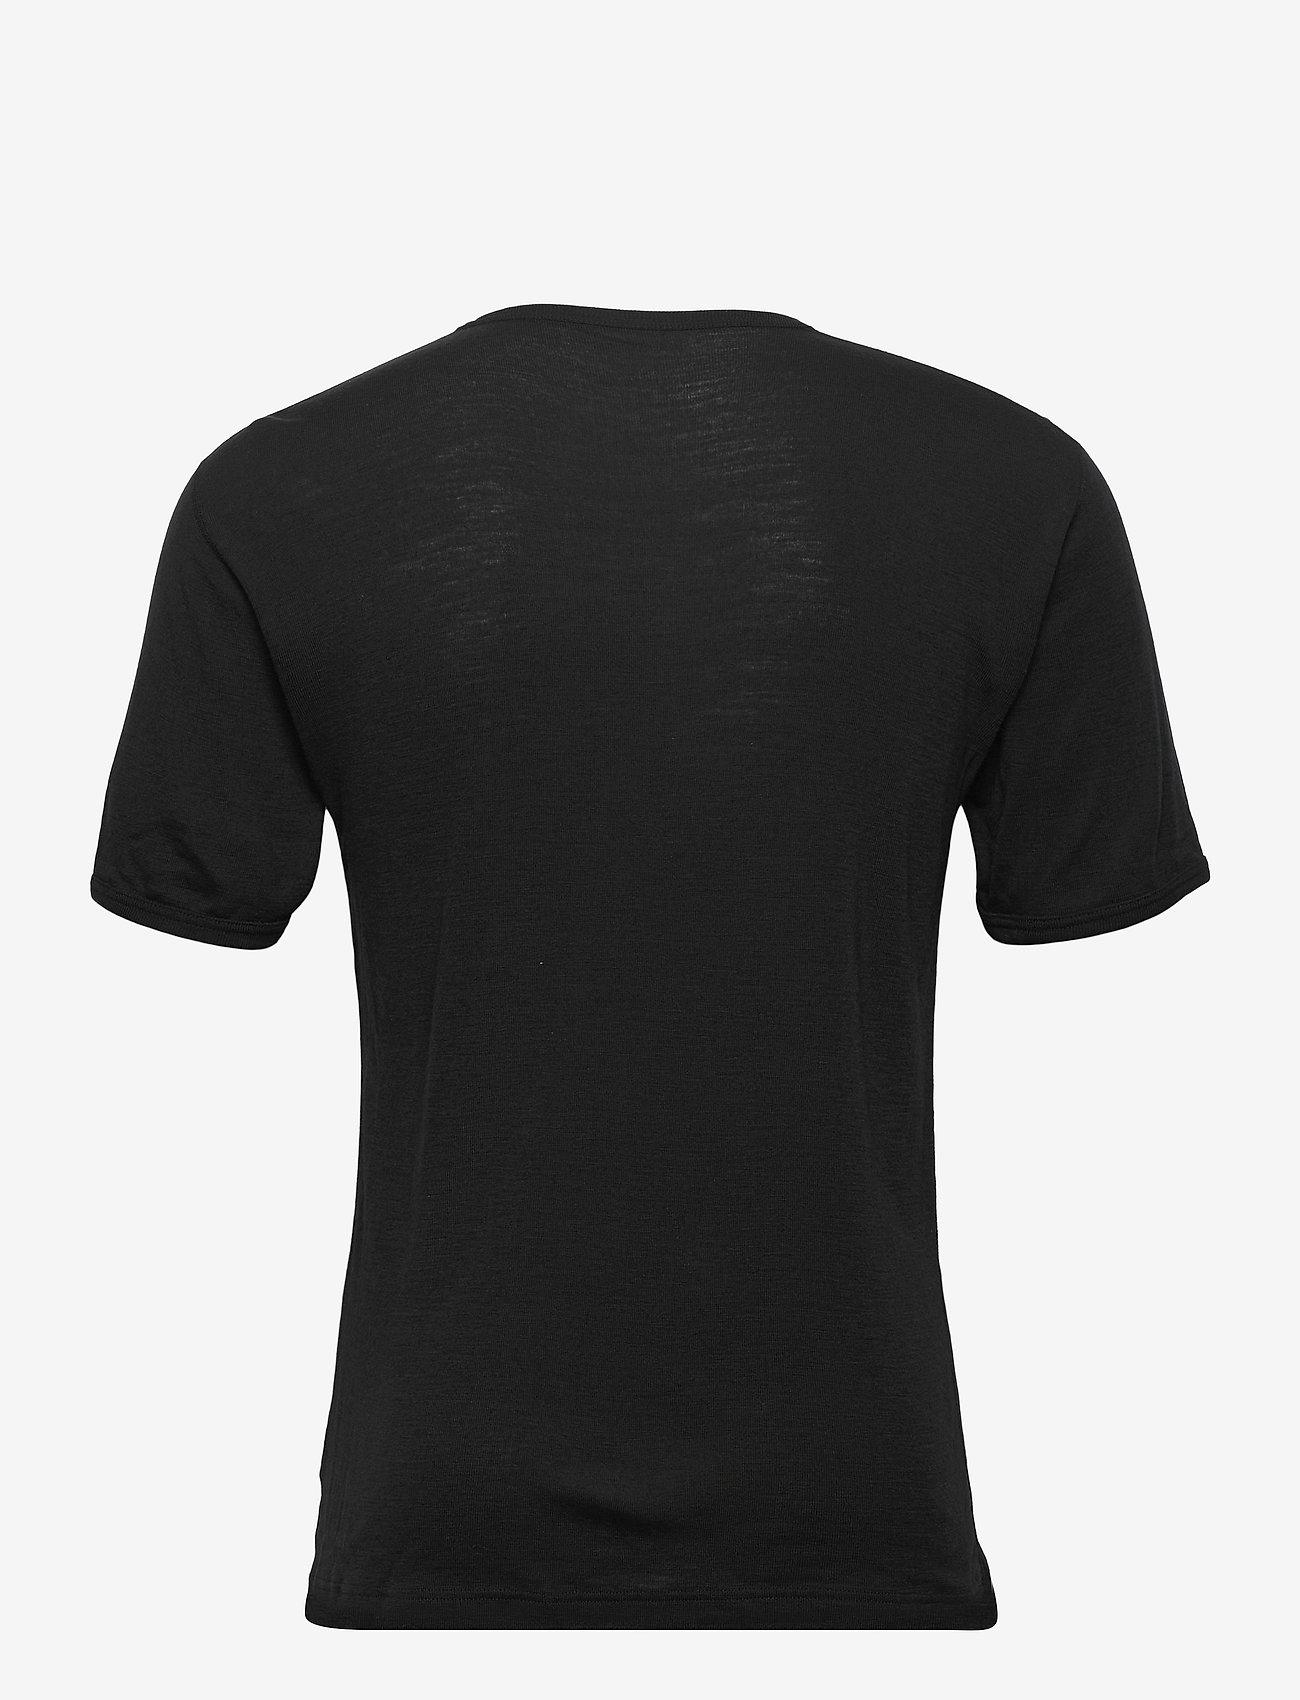 Dovre - T-shirts 1/4 ærme - t-krekli ar īsām piedurknēm - sort - 1